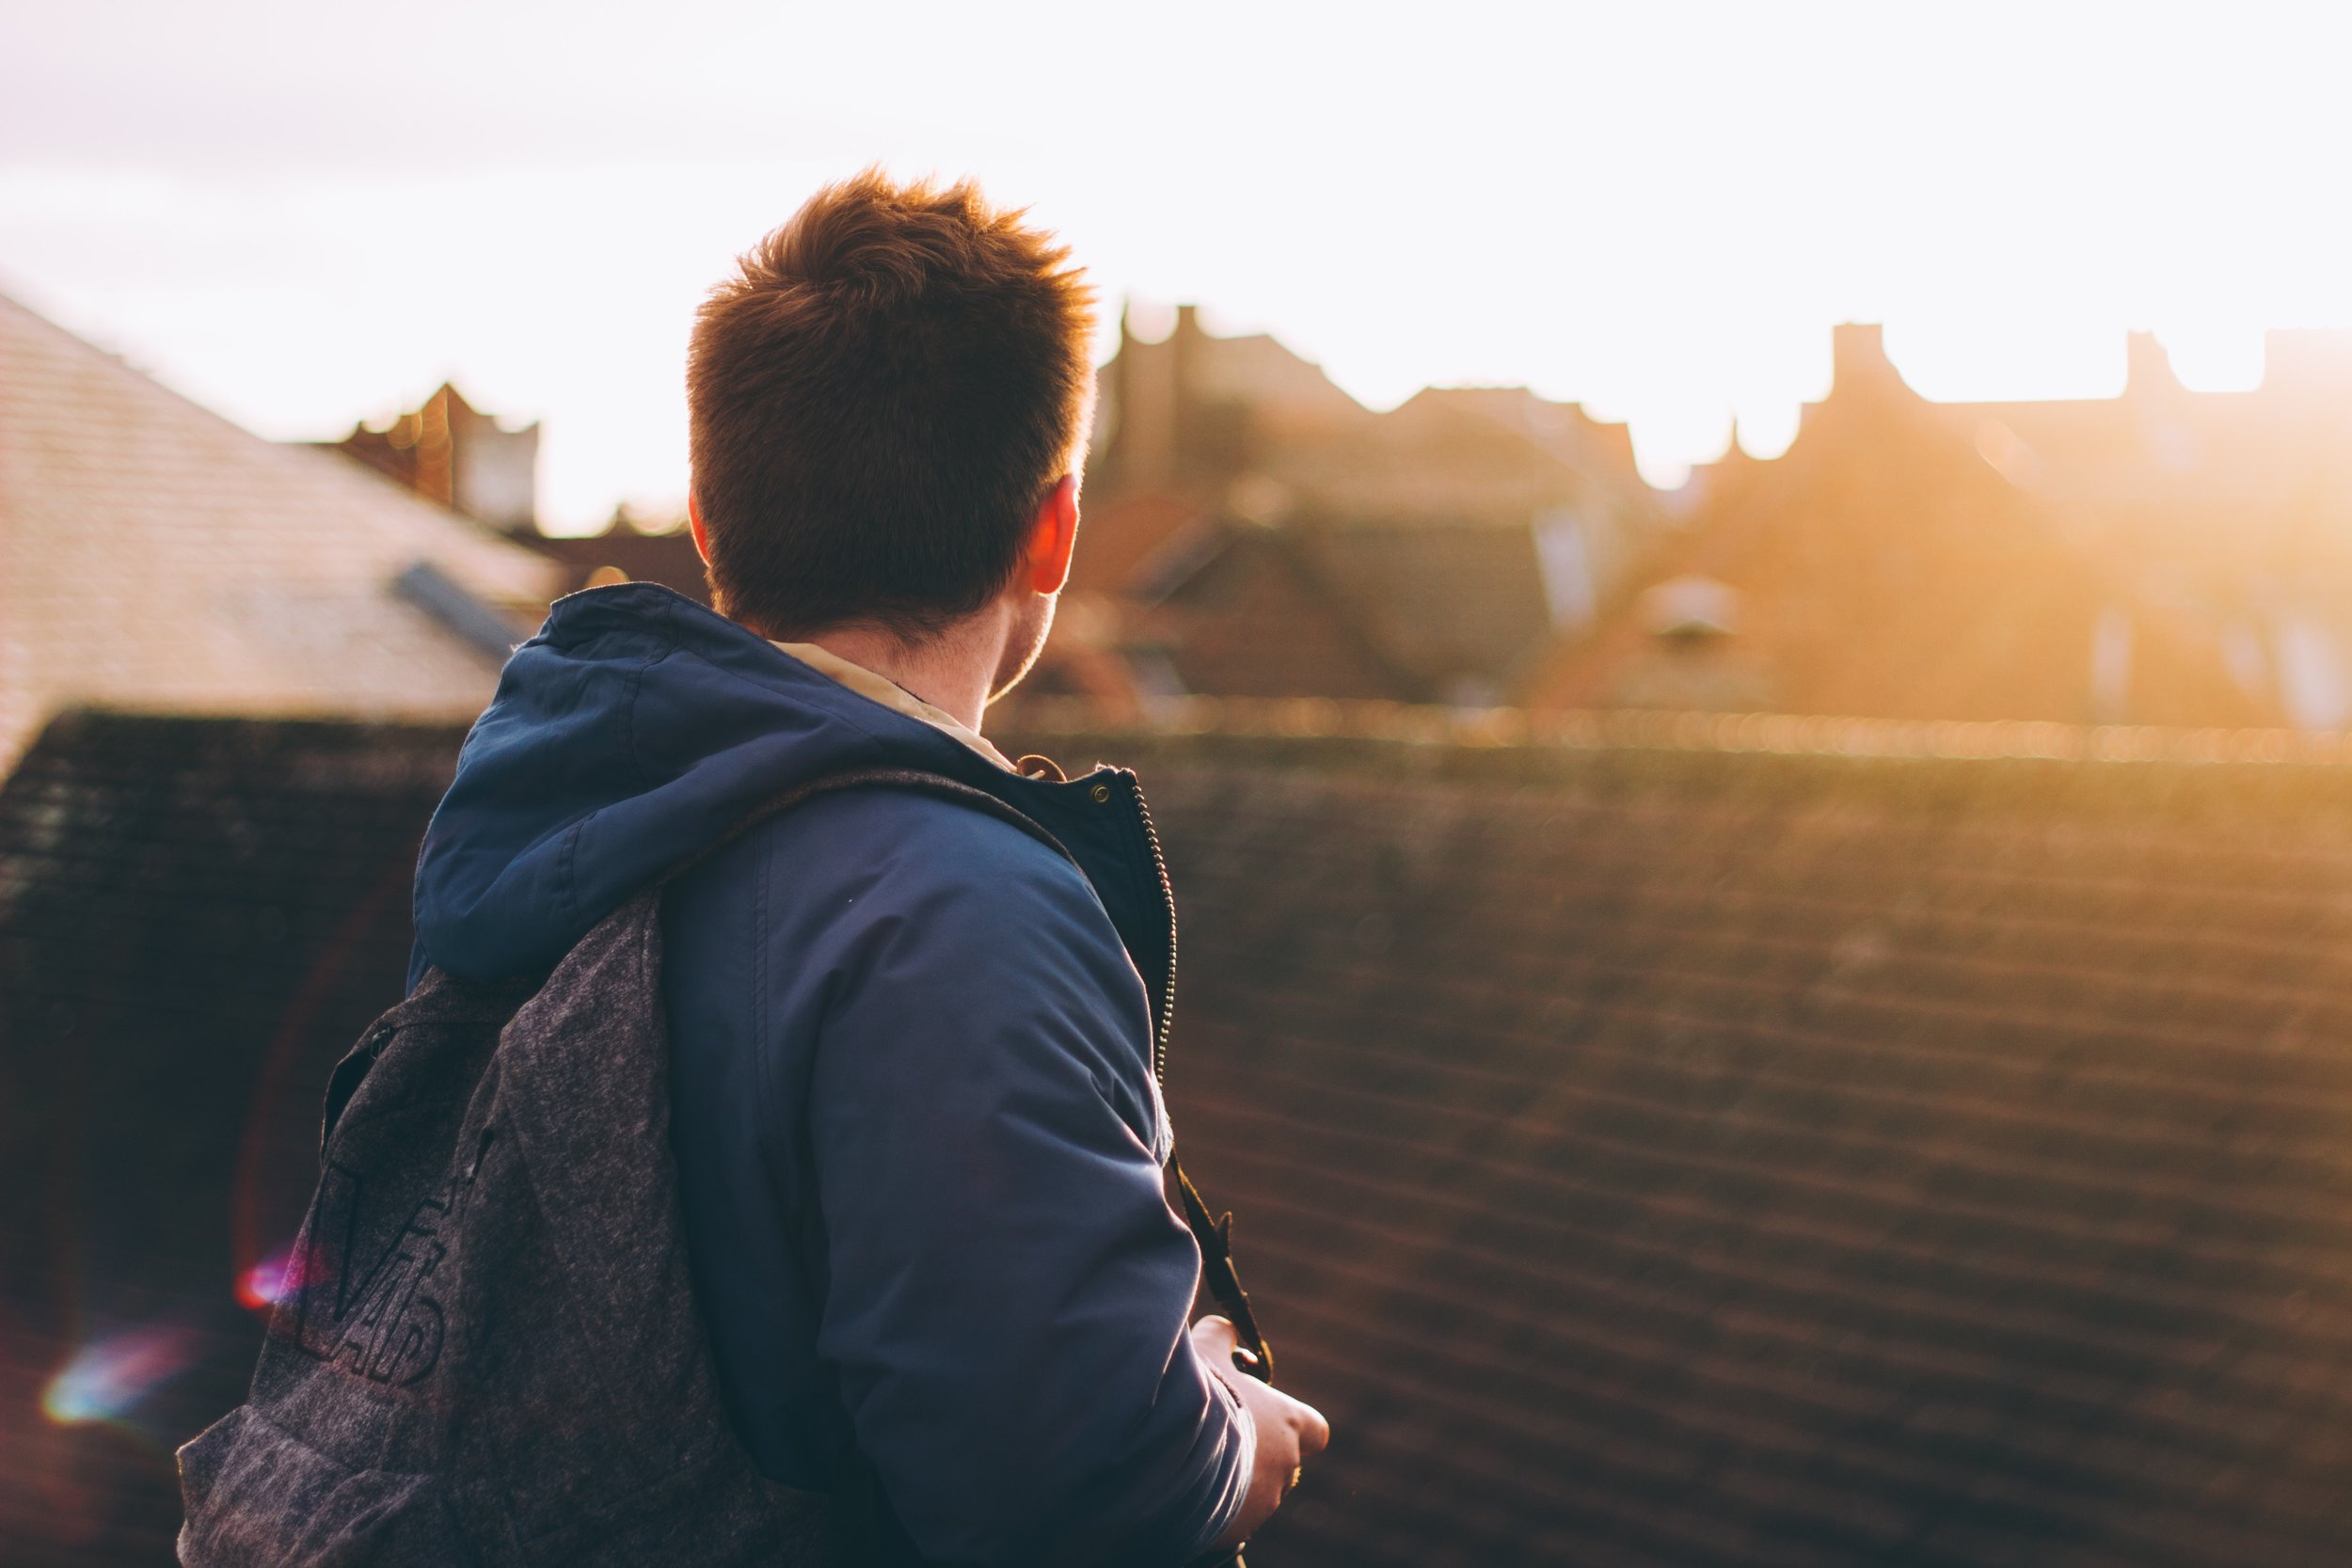 Student with backpack facing away (photo credit Viktor Hanacek).